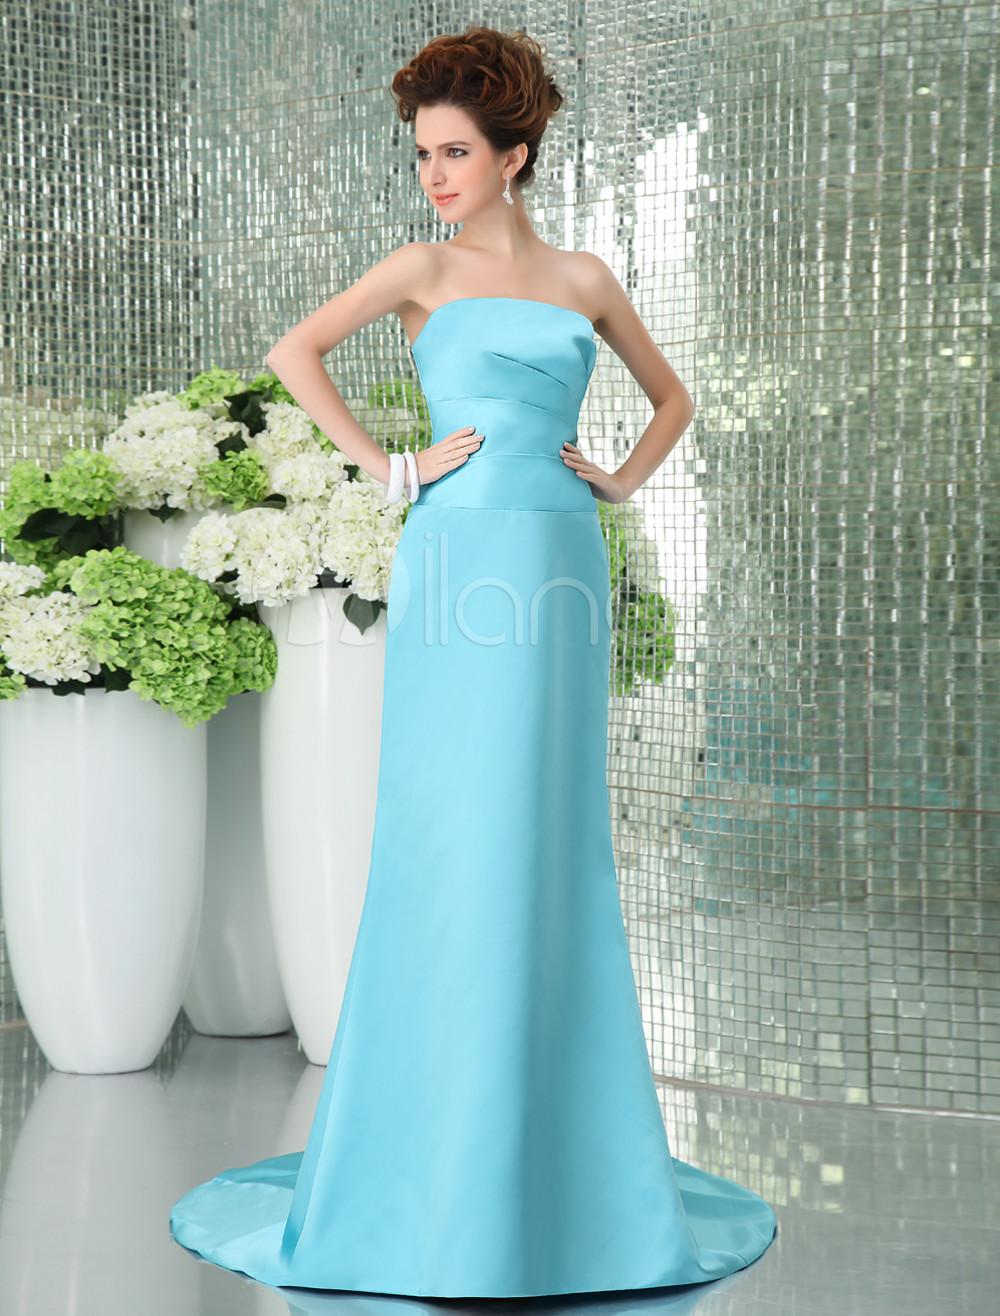 Charming Strapless Satin Bridesmaid Dress